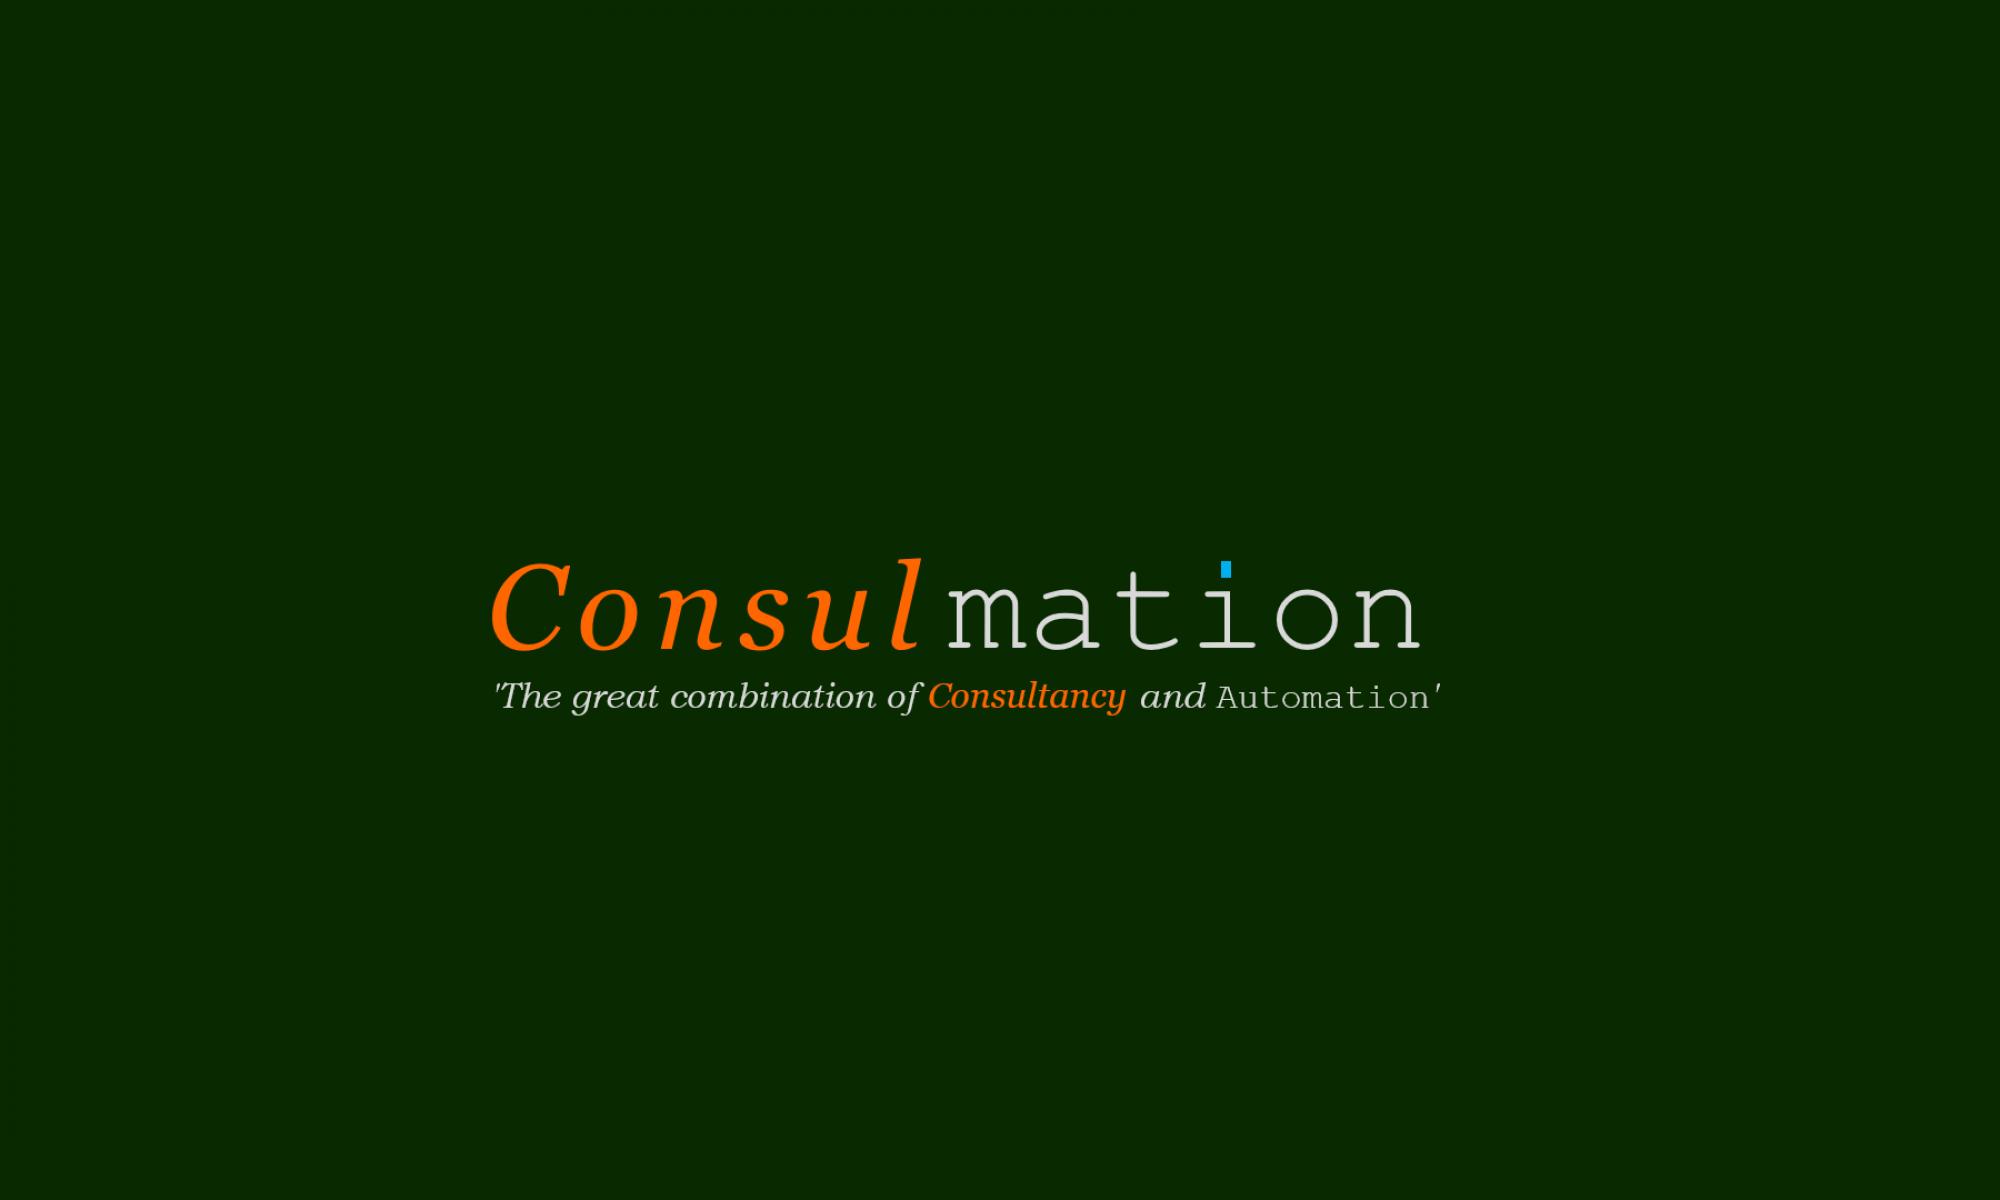 Consulmation